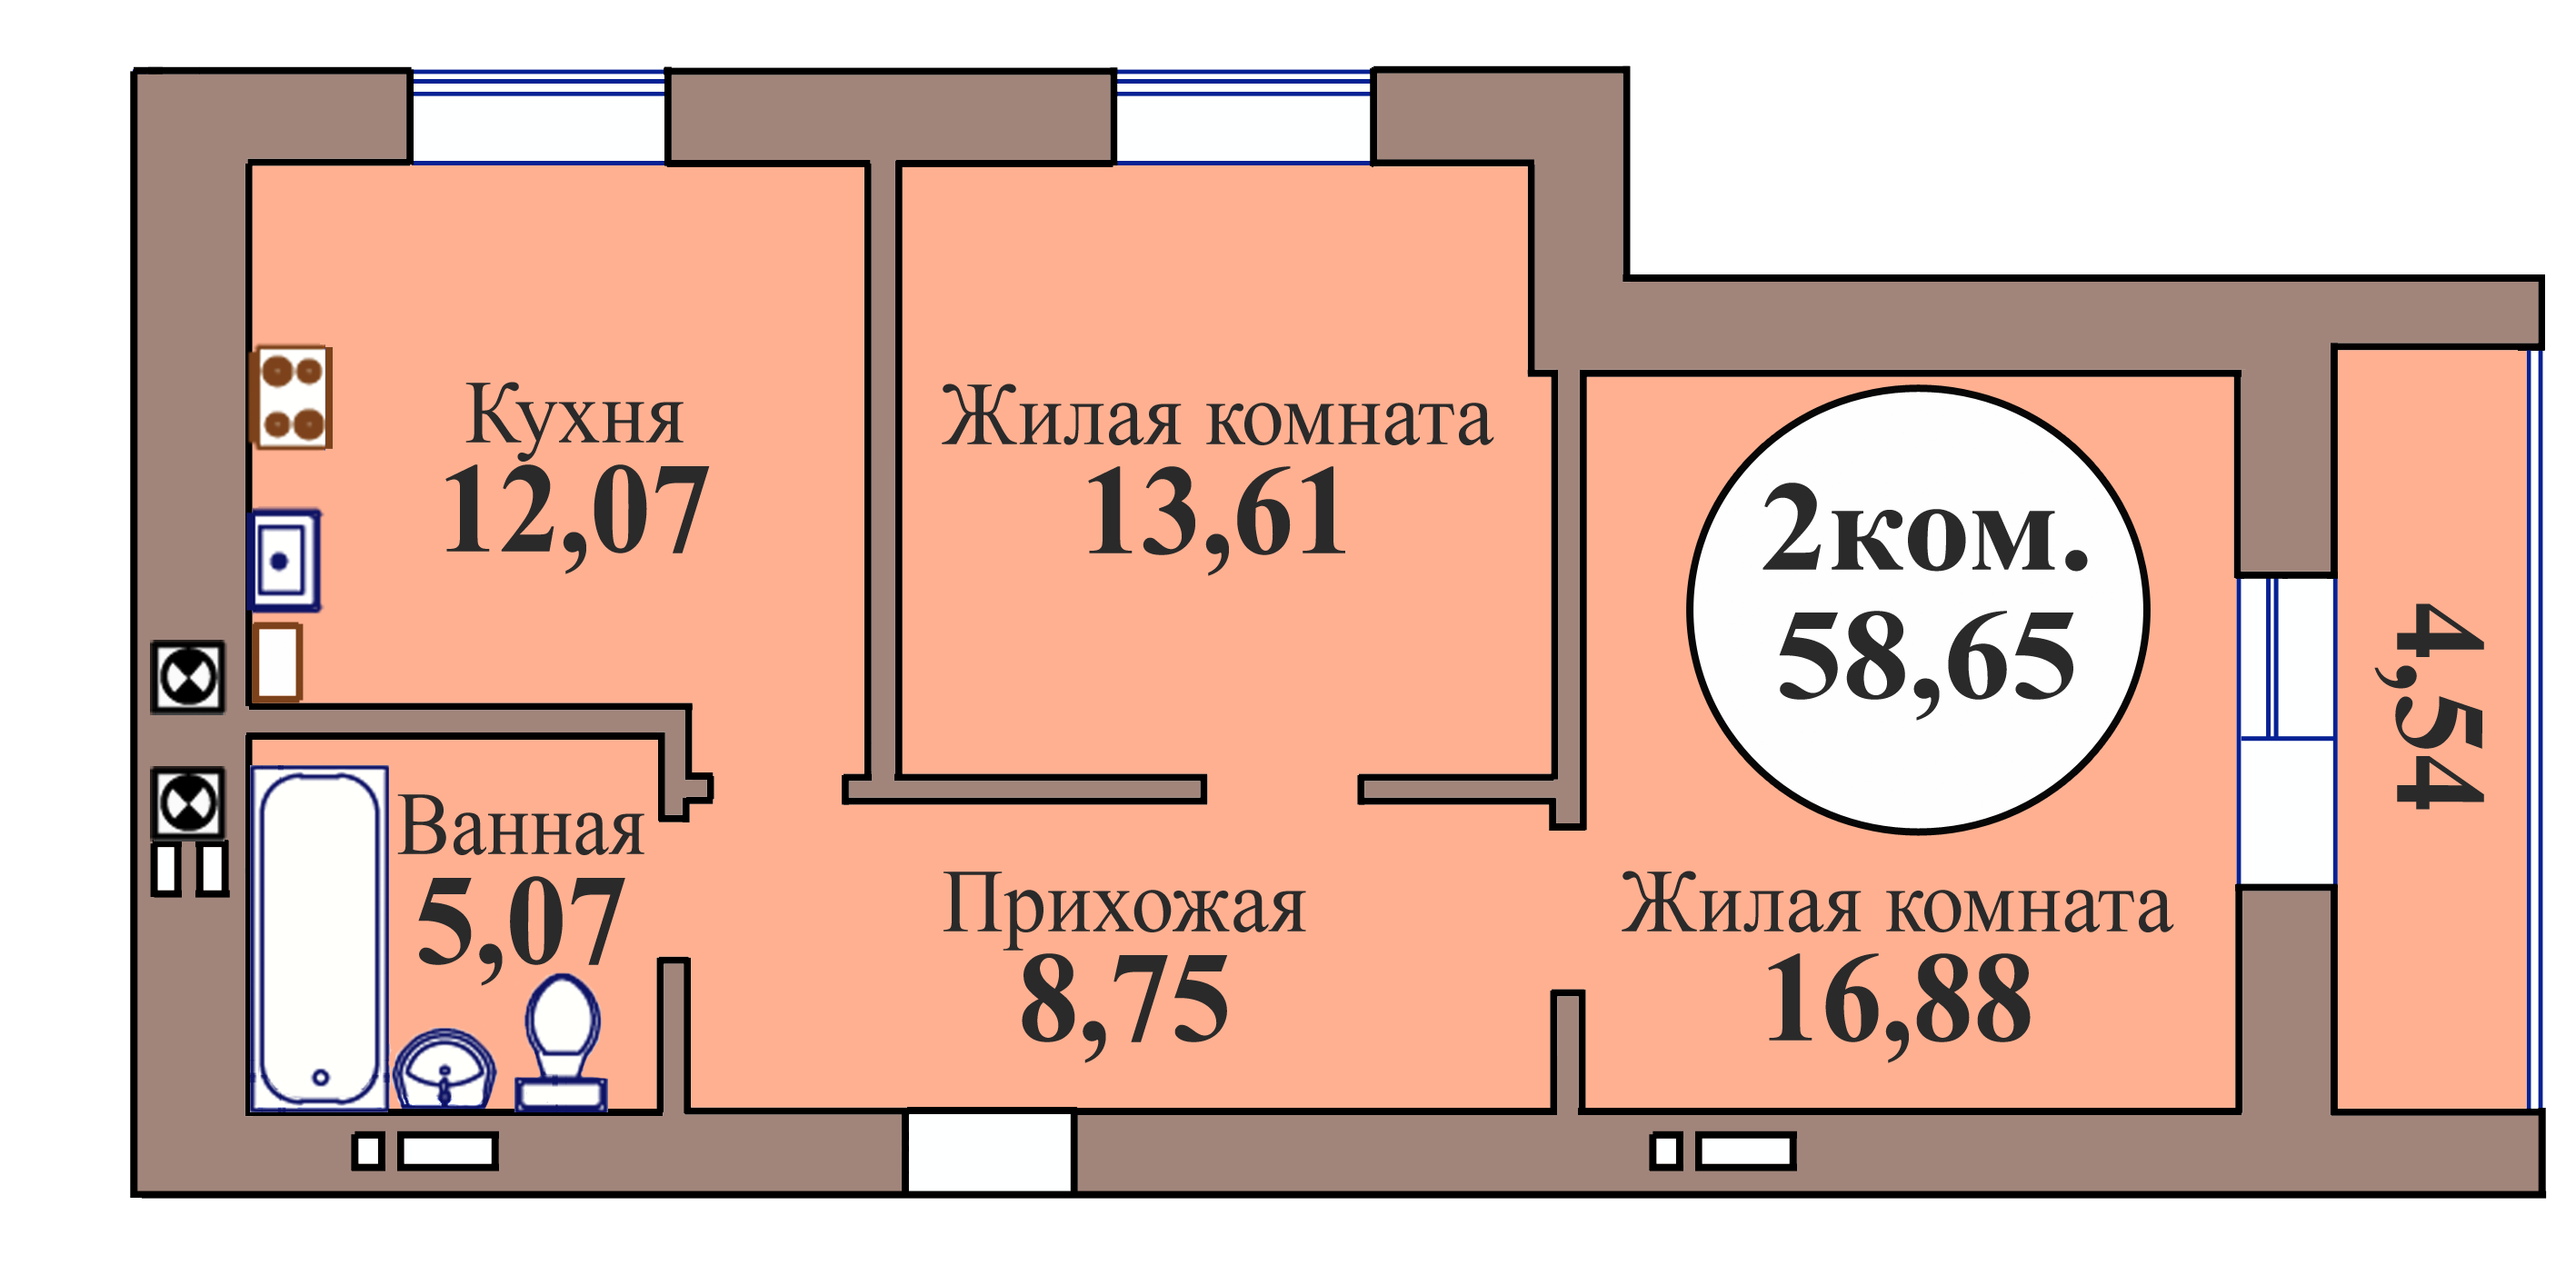 2-комн. кв. по пер. Калининградский, 5 кв. 158 в Калининграде